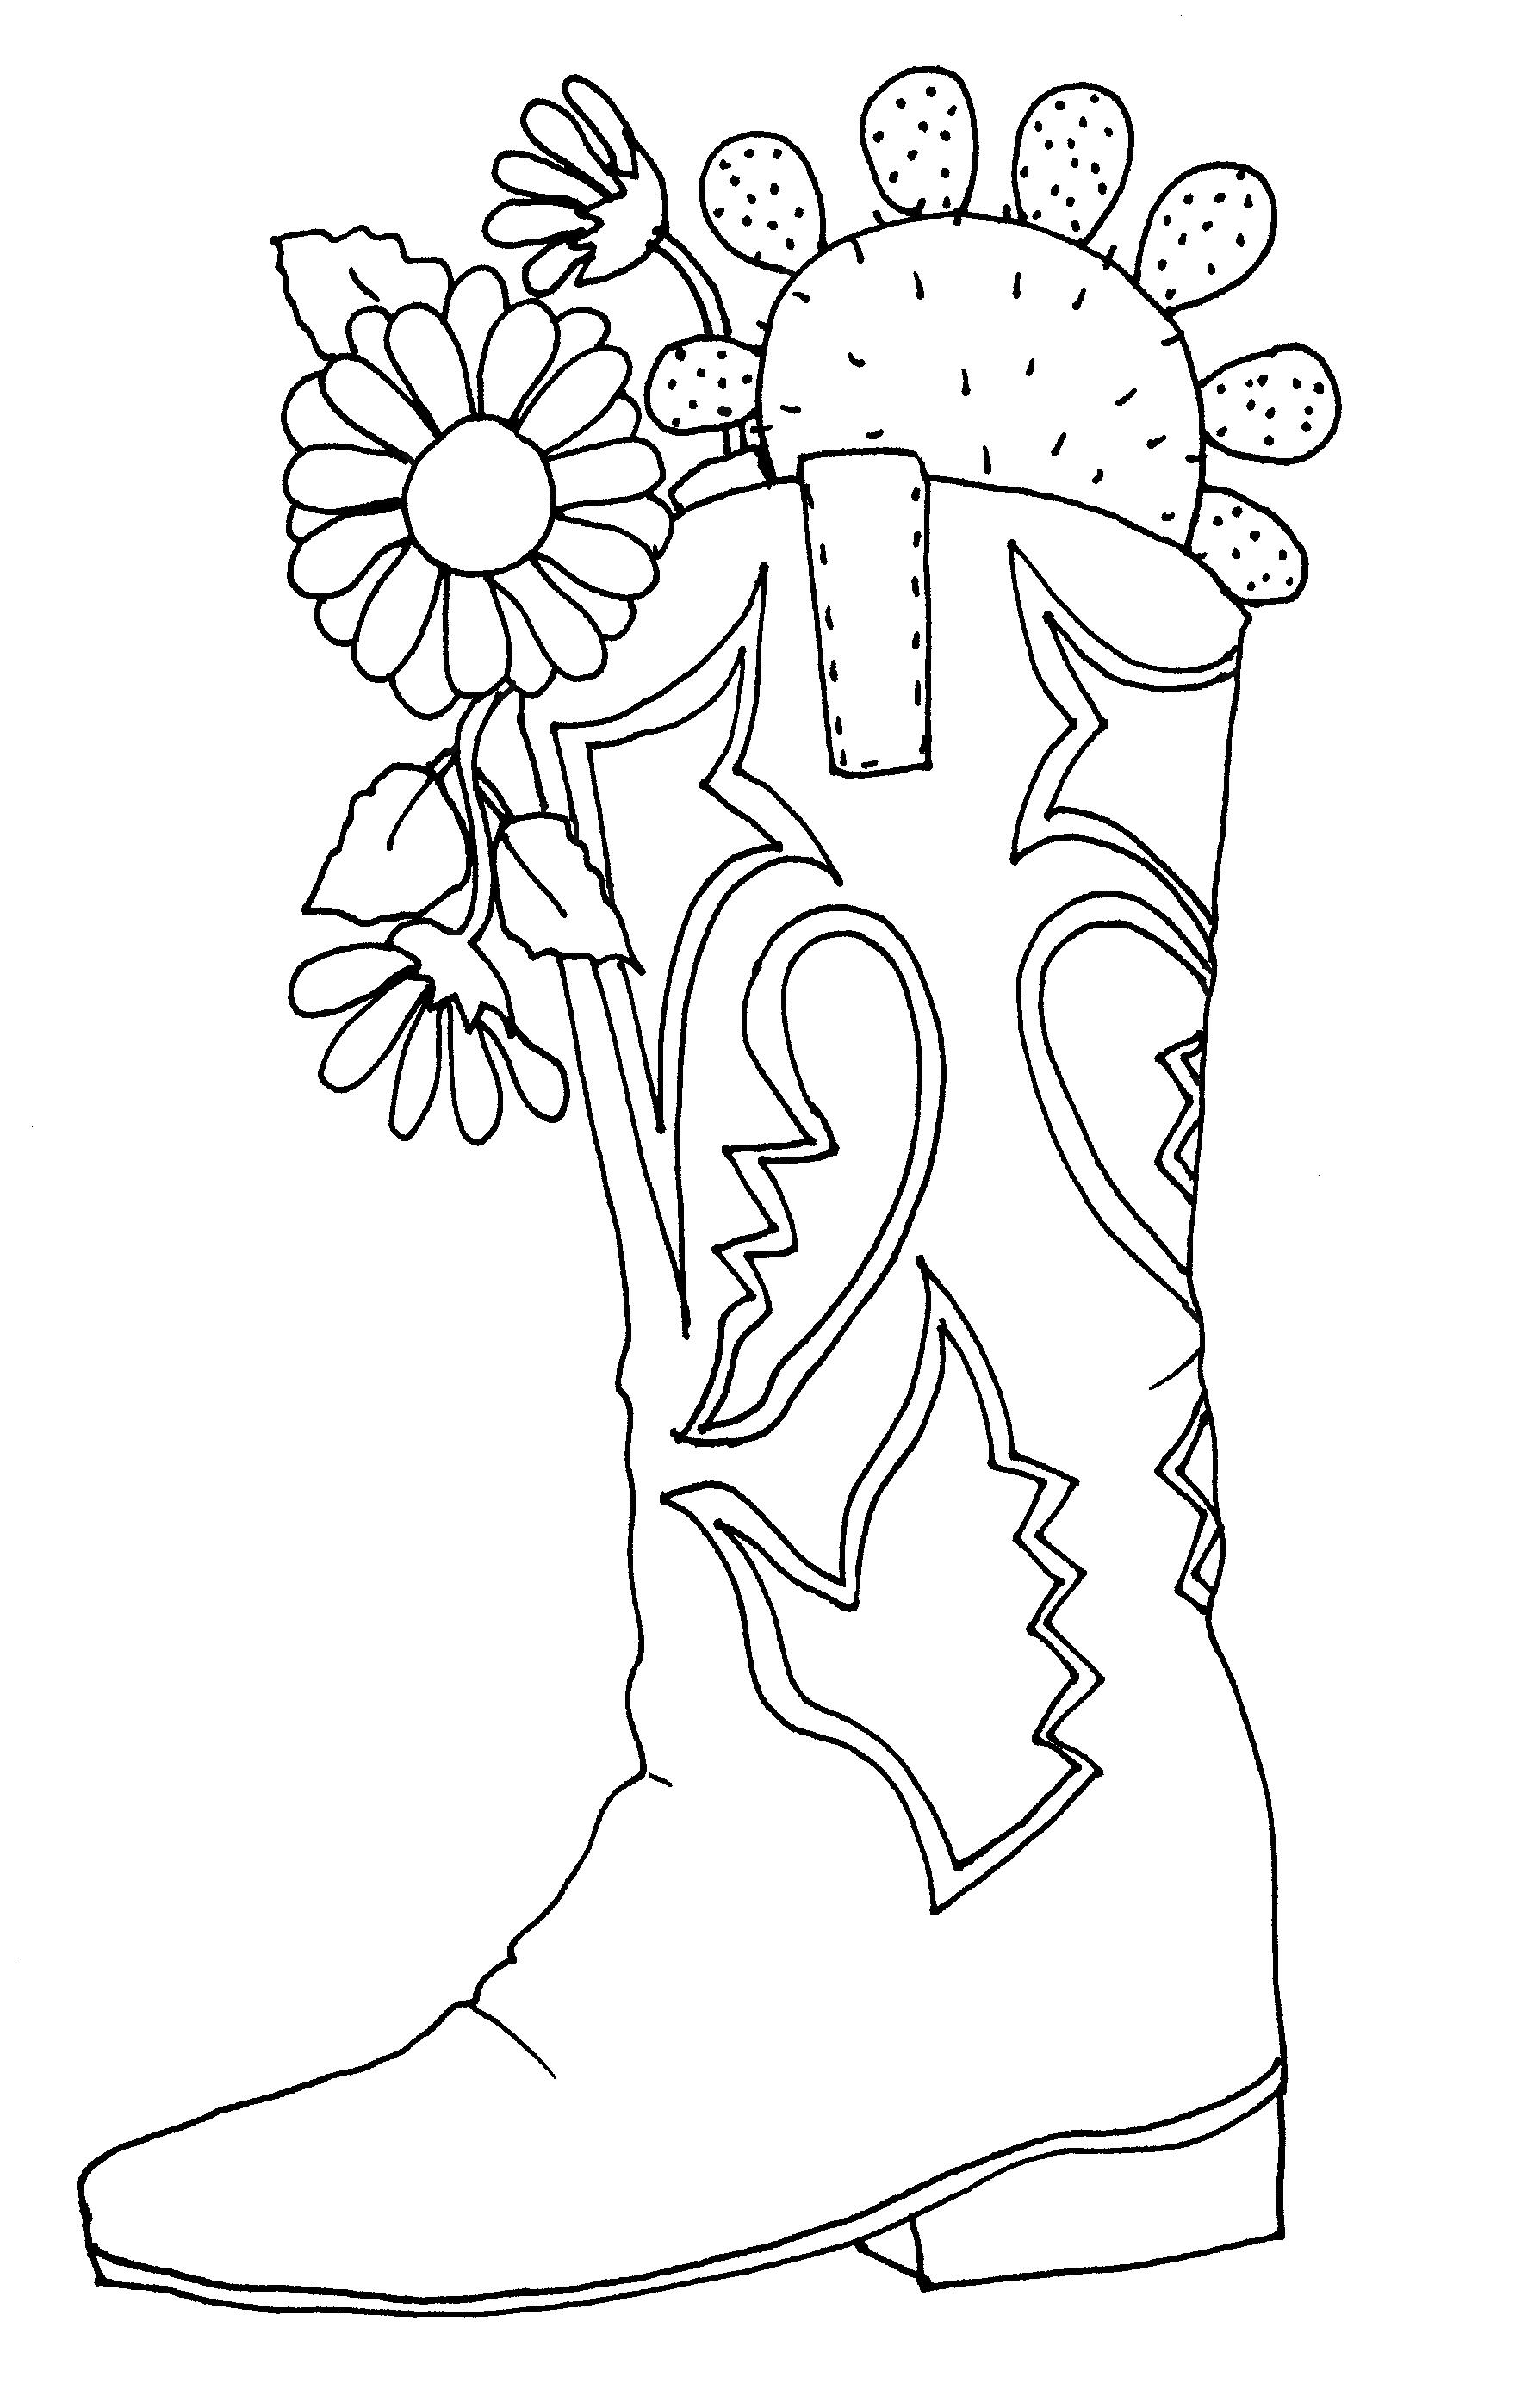 Cowboy-Boot.png 1,788×2,796 pixels | Rhinestone and boroque ...